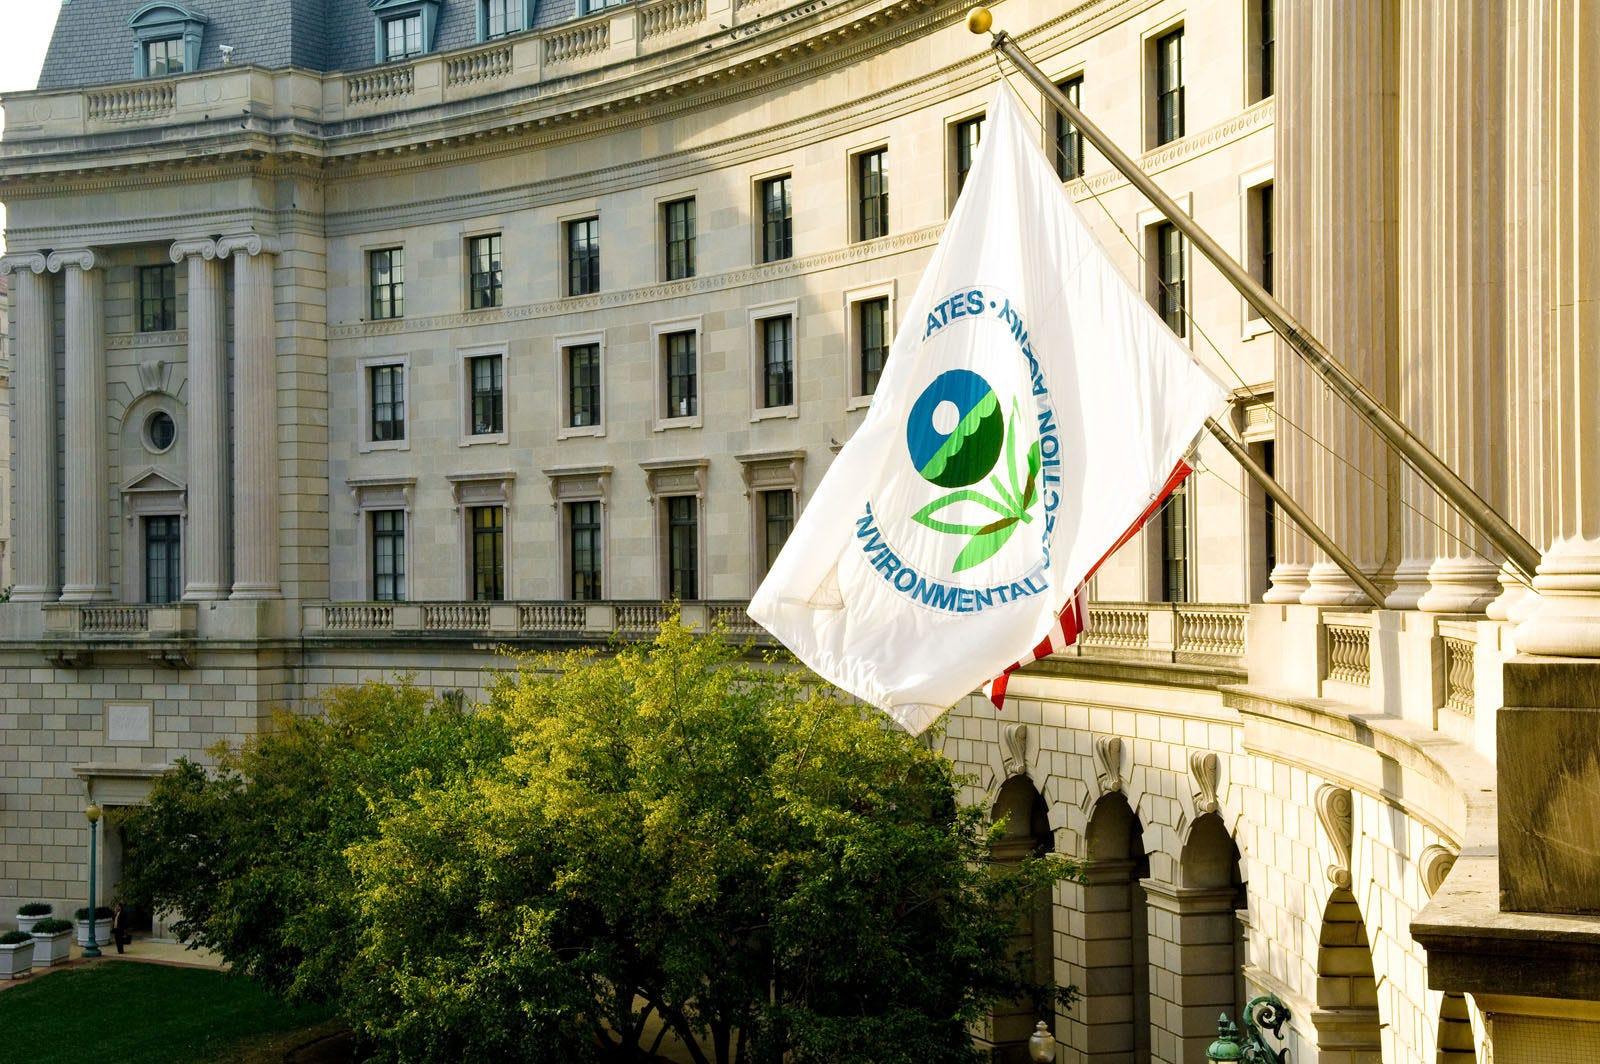 The EPA flag flying outside the EPA building in Washington, D.C.